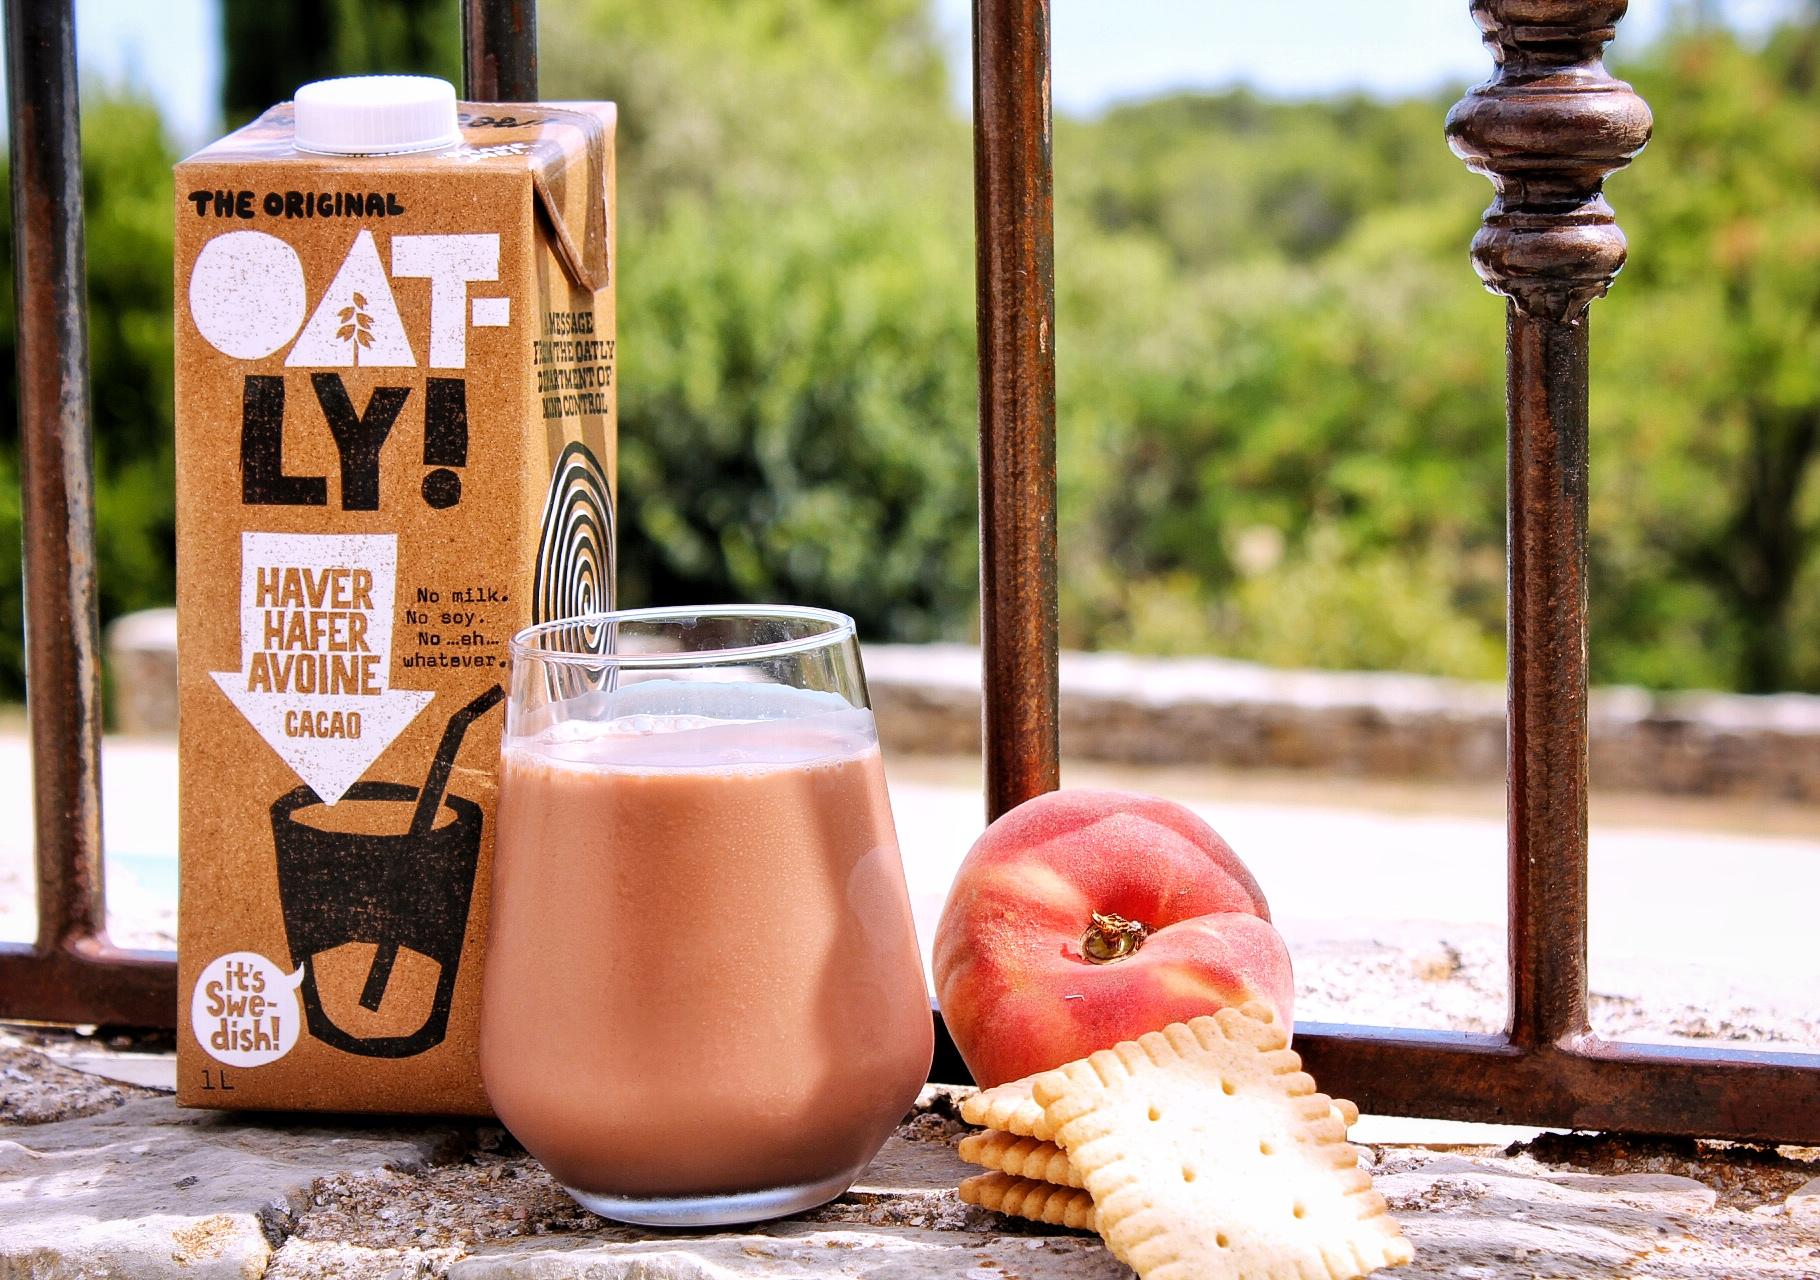 Goûter oatly chocolat pêche biscuits vegan sans gluten sans lactose